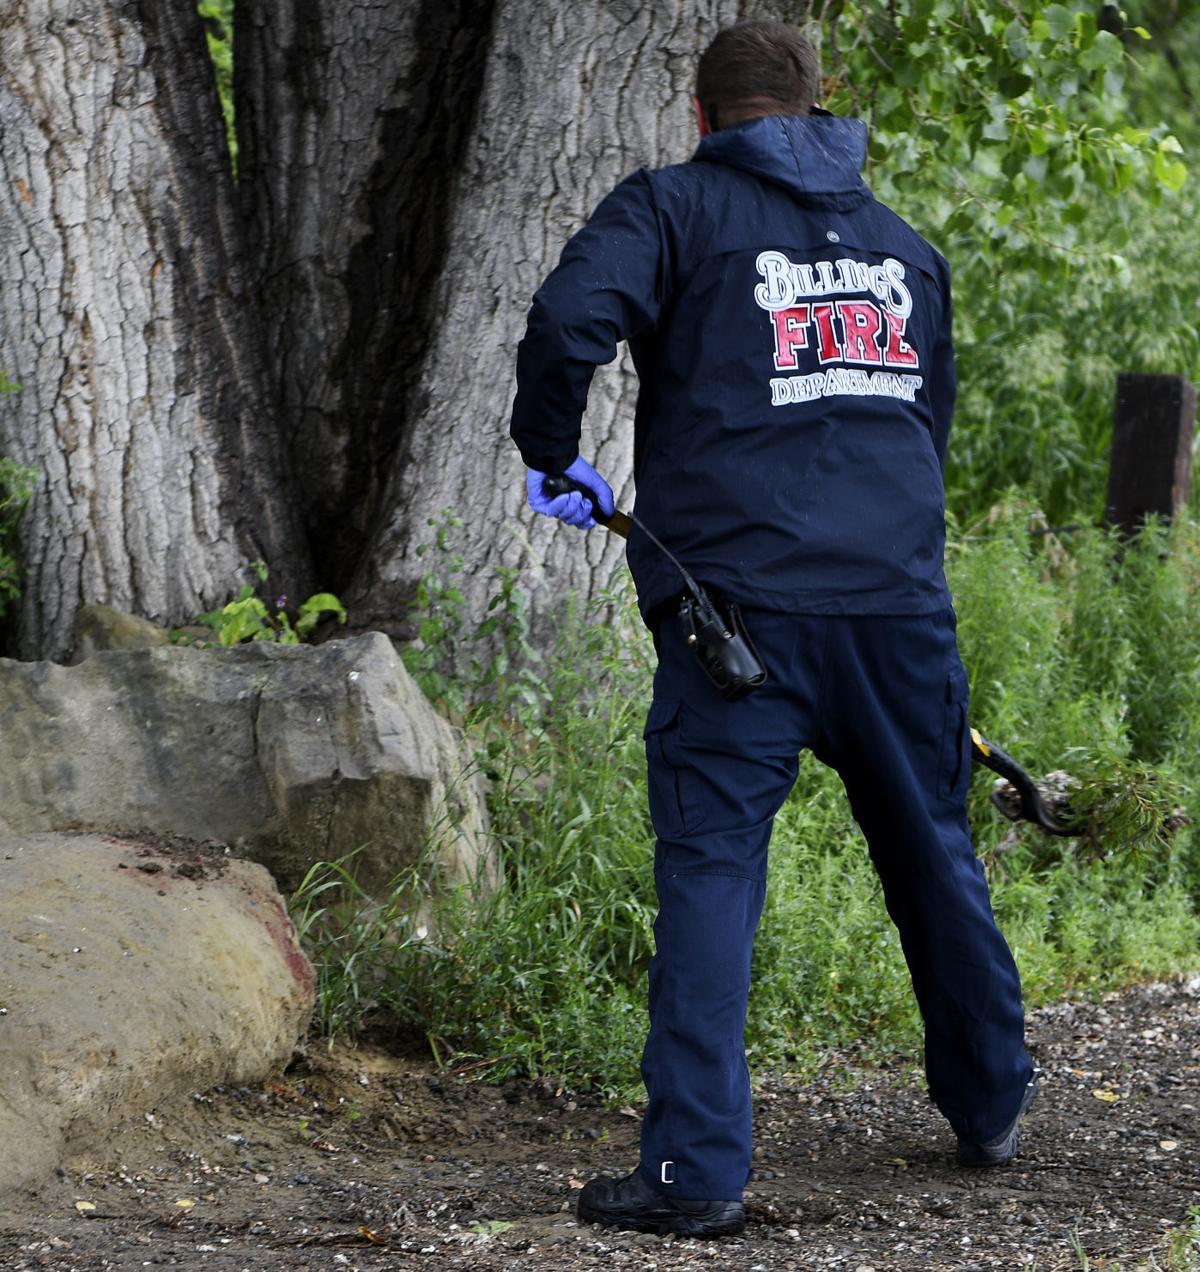 Riverfront Park stabbing